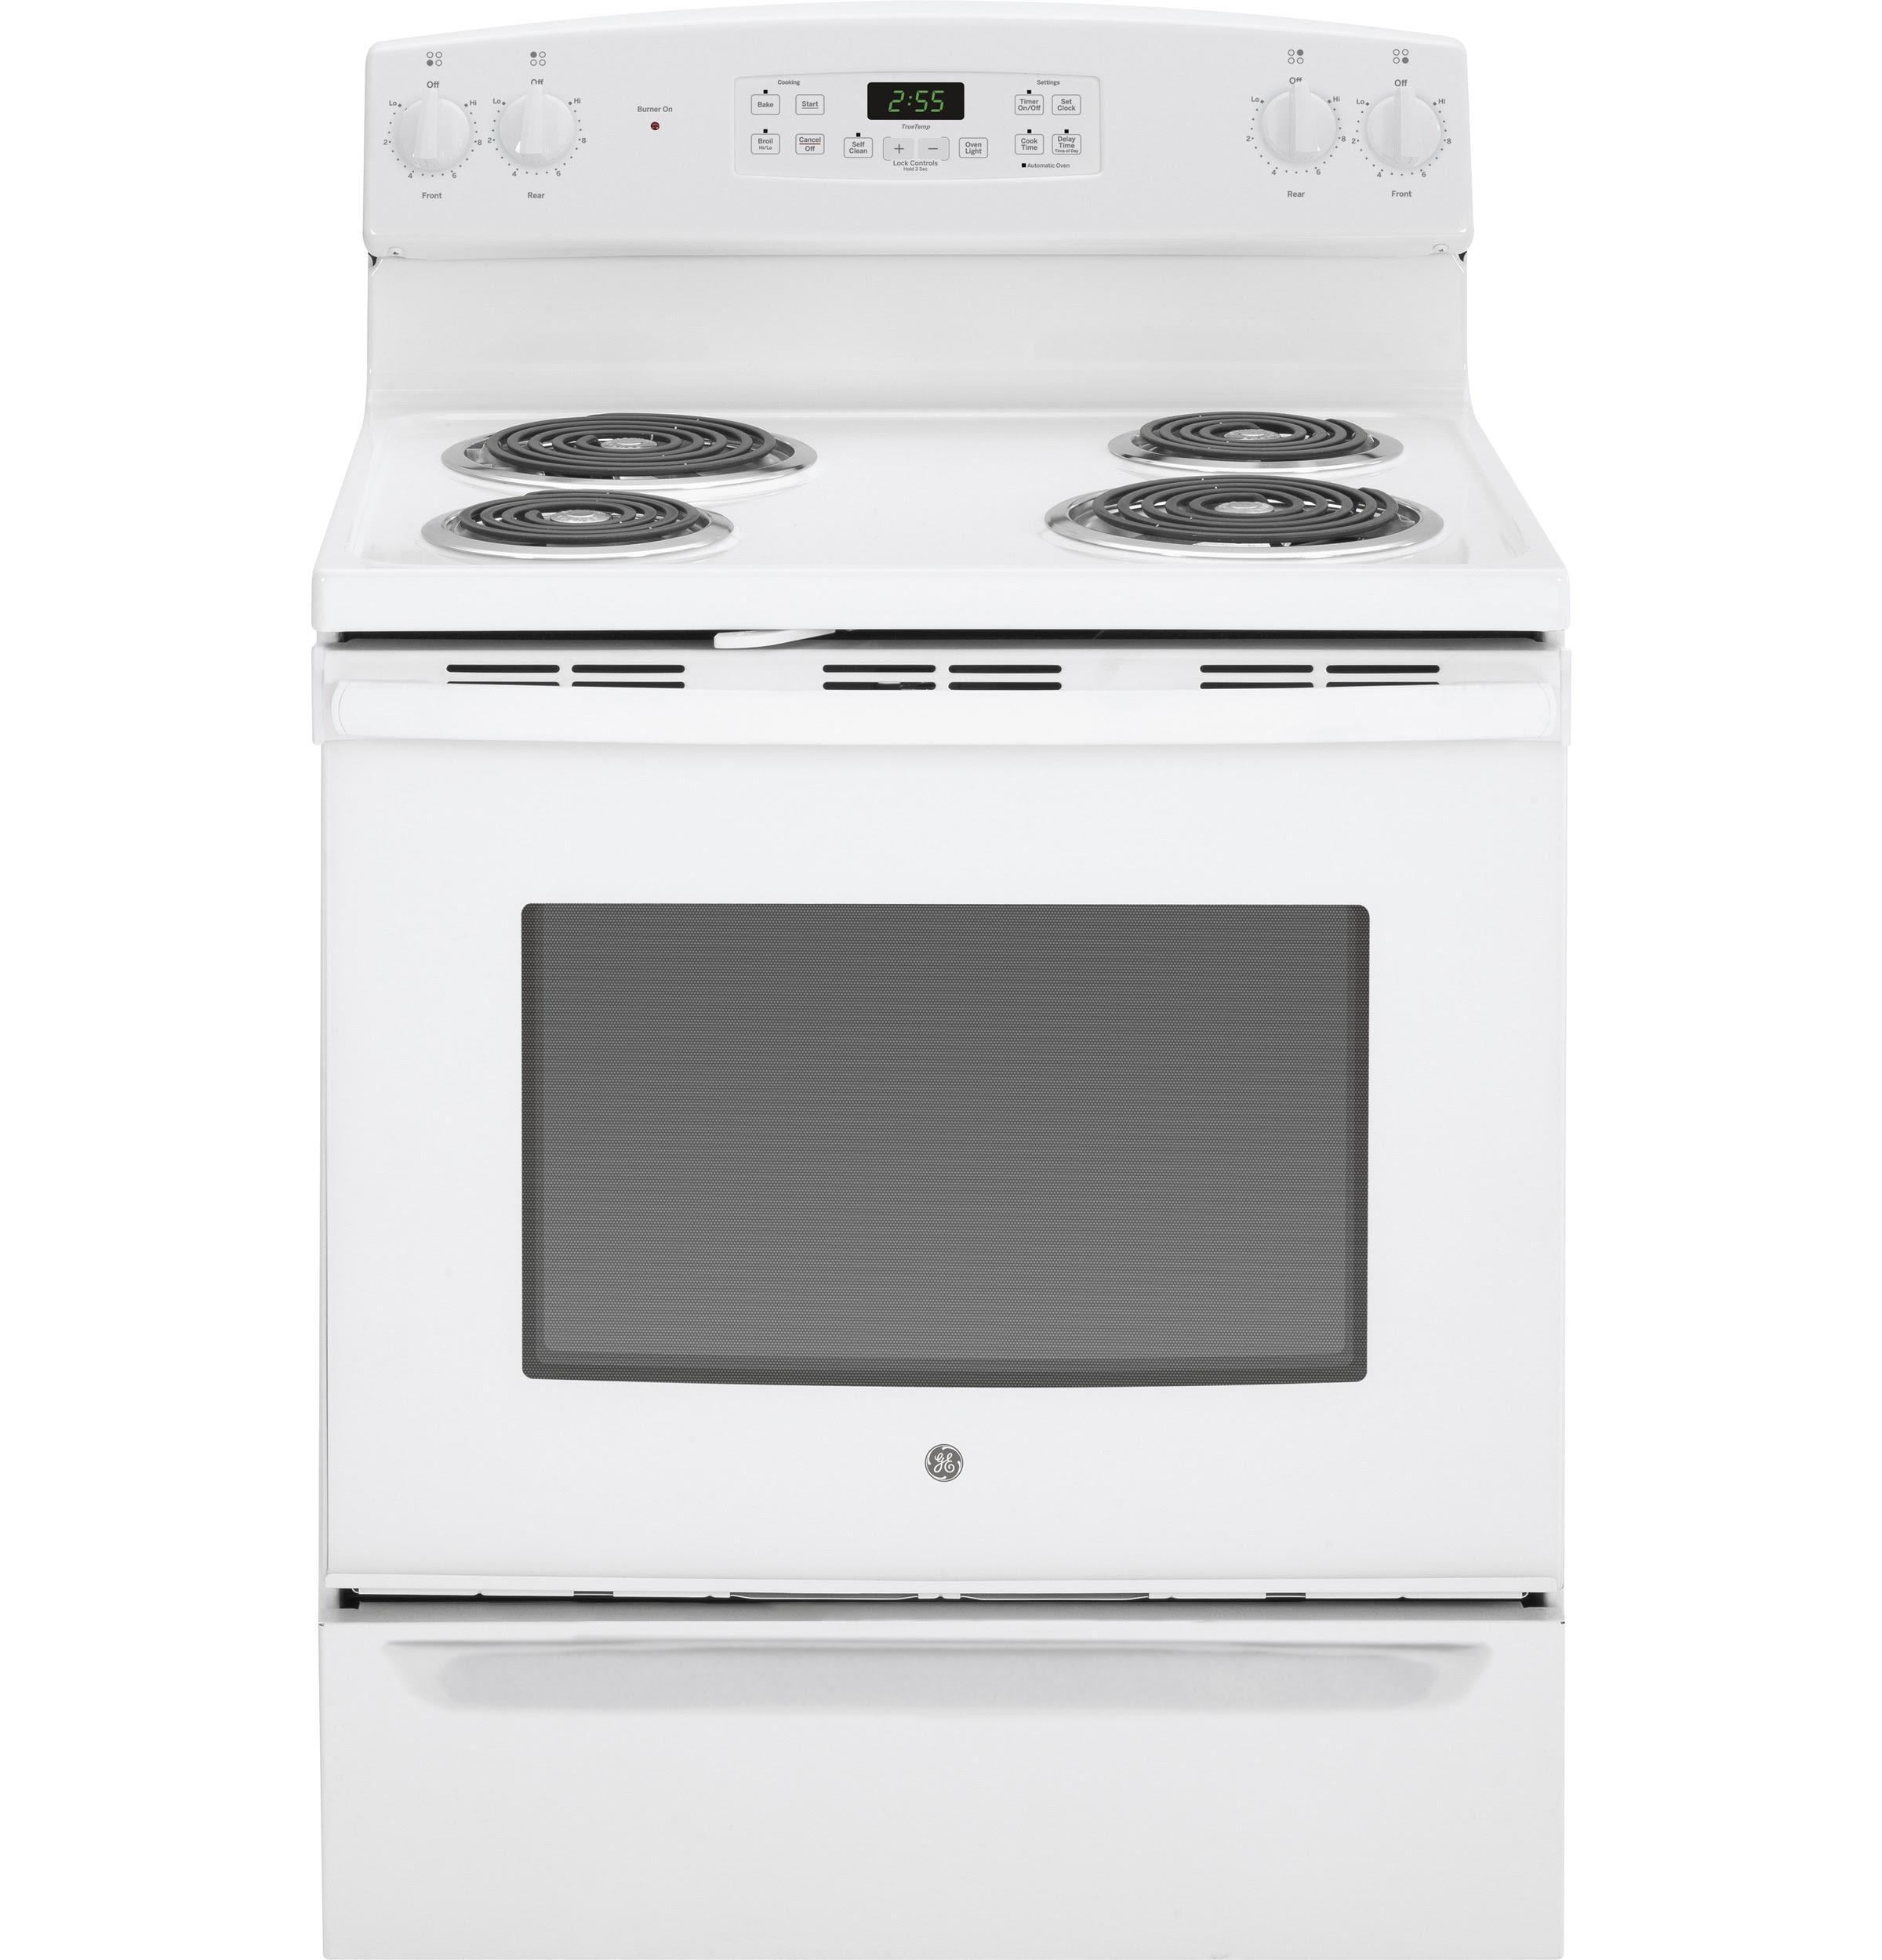 GE Appliances JB255DJWW 5 0 cu ft Freestanding Electric Range White